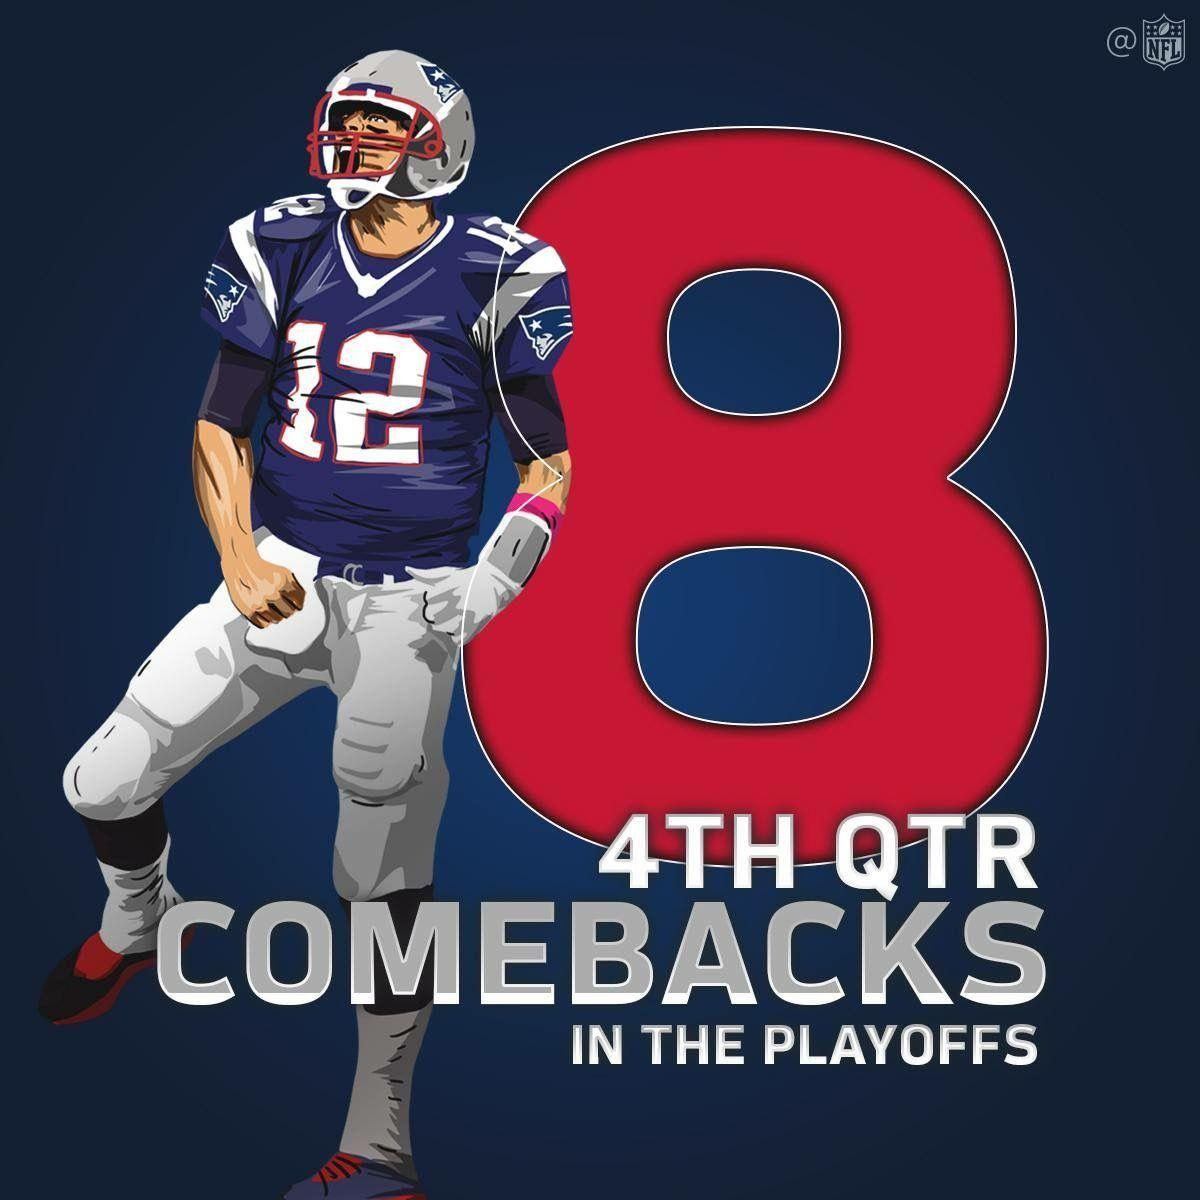 Pin By Jennifer Saucier On Patriots Nfl Football Funny New England Patriots